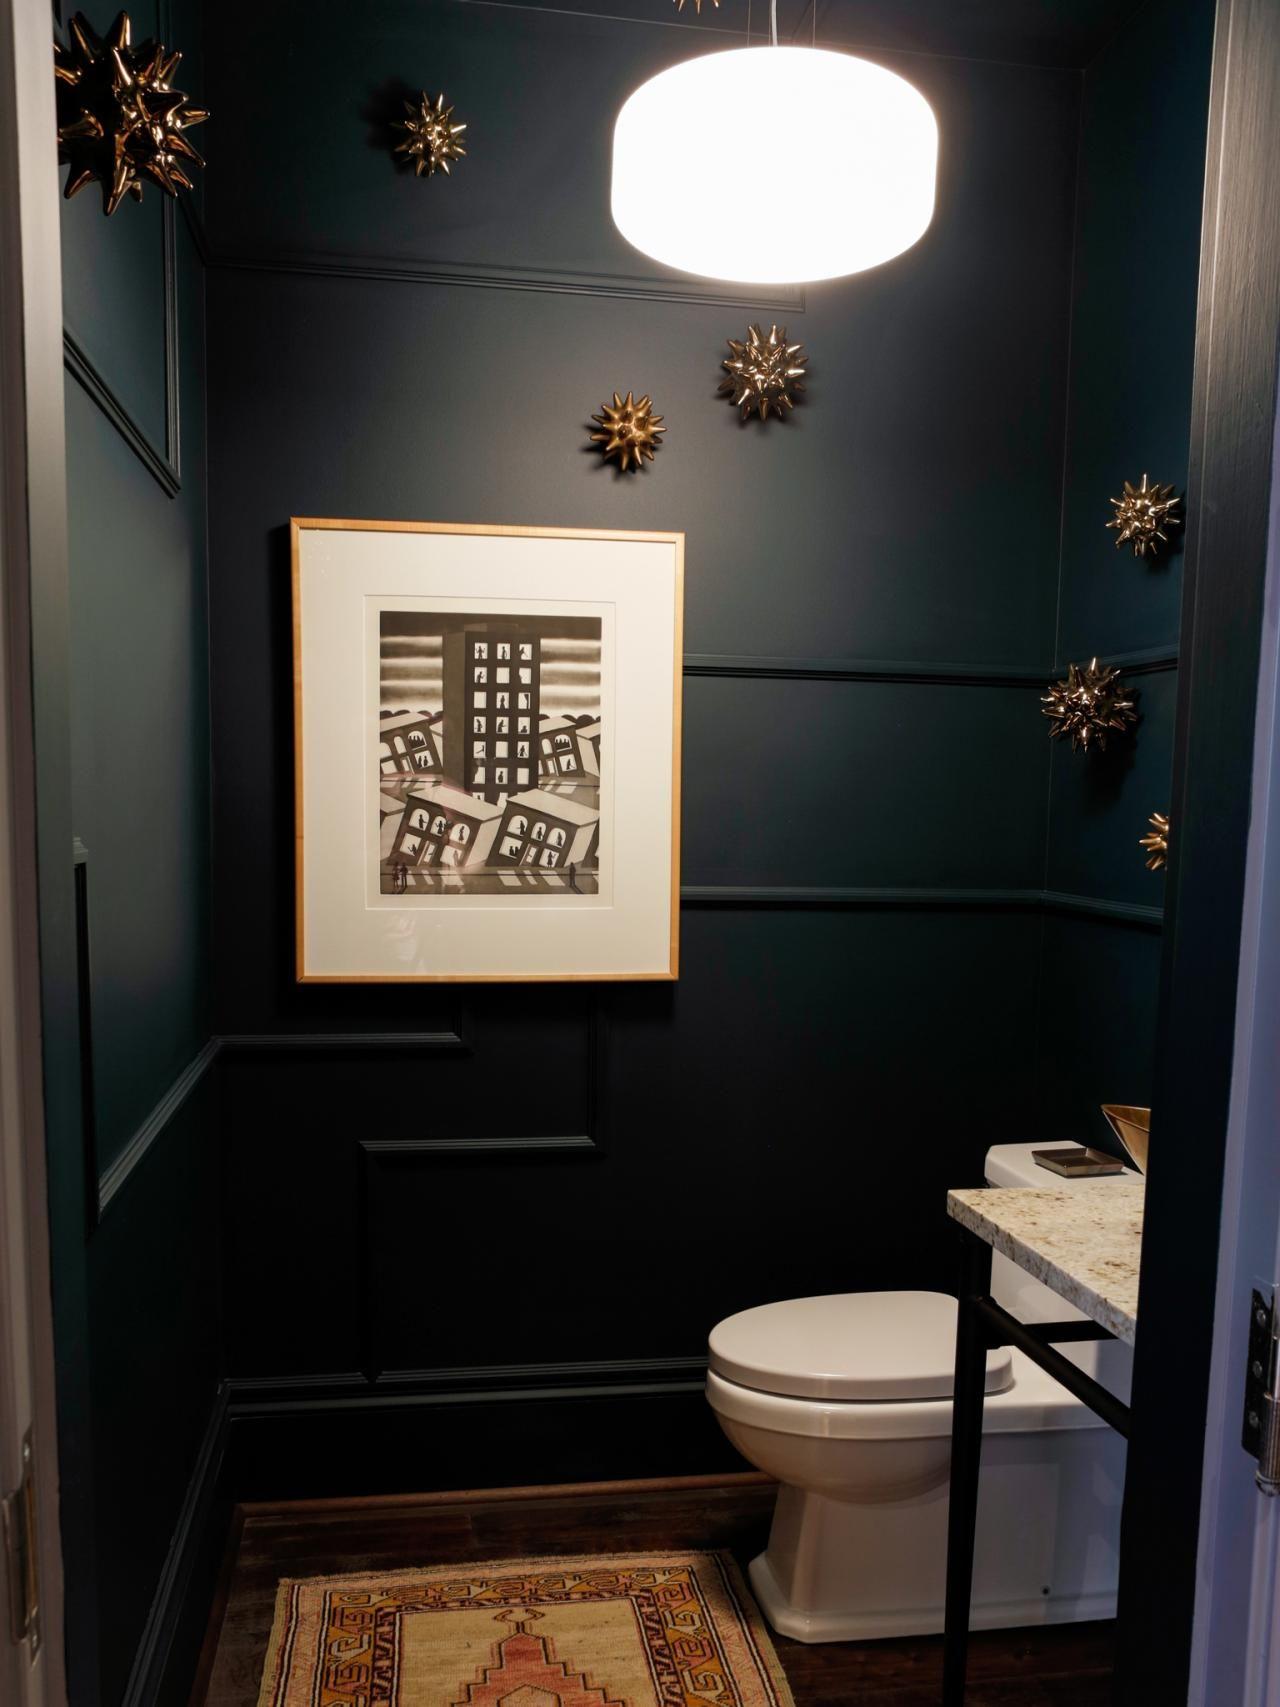 Bathroom Small Paint Ideas No Natural Light Tv Above Powder Room Dining Asian Large Nursery Bath Medit Small Dark Bathroom Stylish Bathroom Half Bathroom Decor